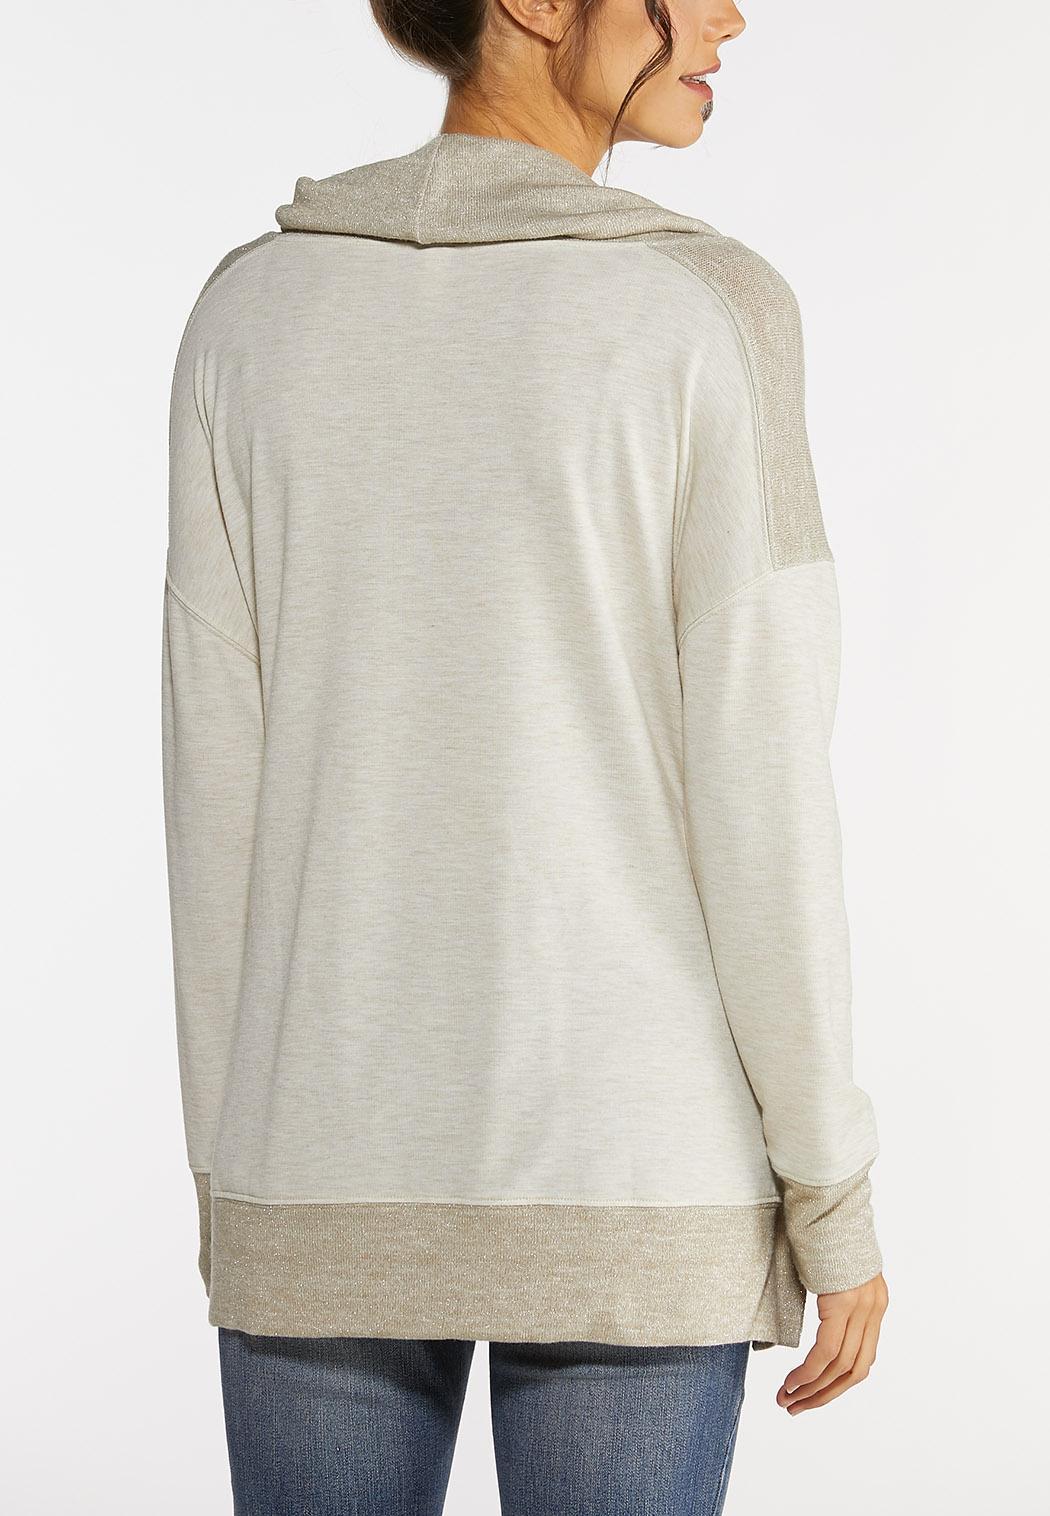 Plus Size Snap Cowl Neck Sweatshirt (Item #44020962)